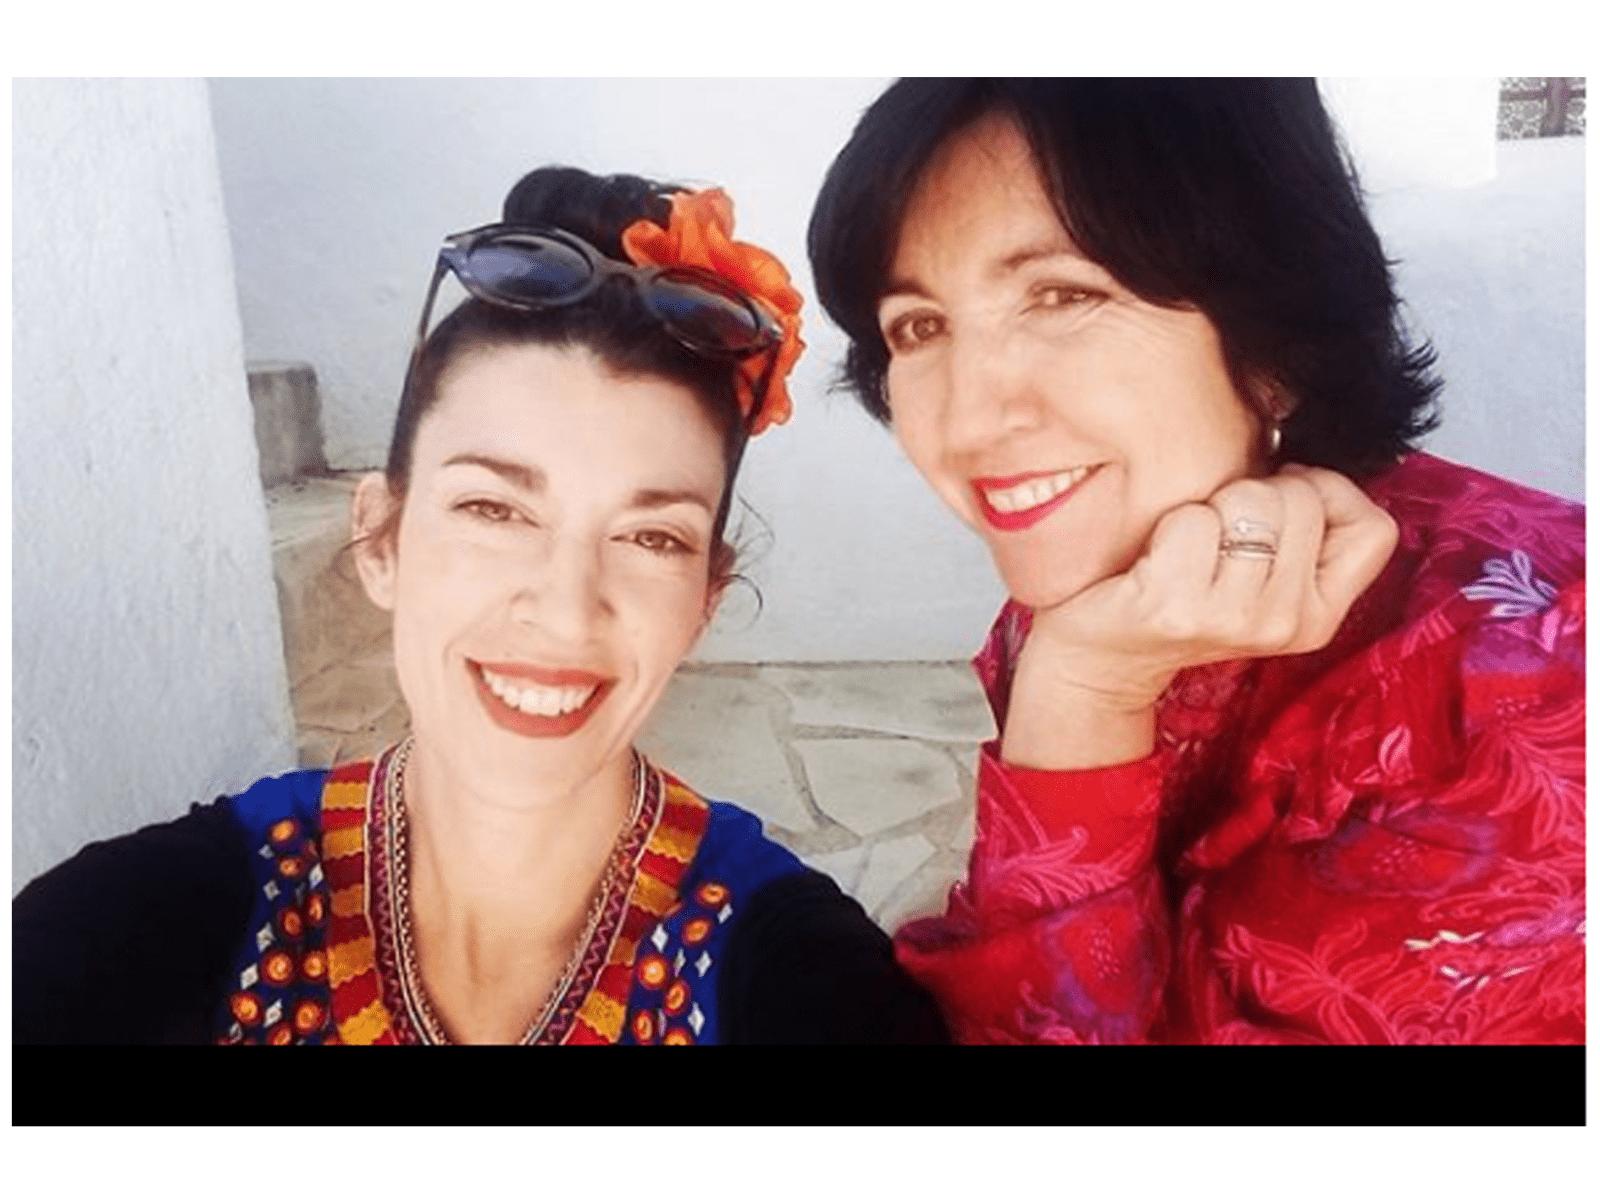 Lucia & Belen from Ibiza, Spain